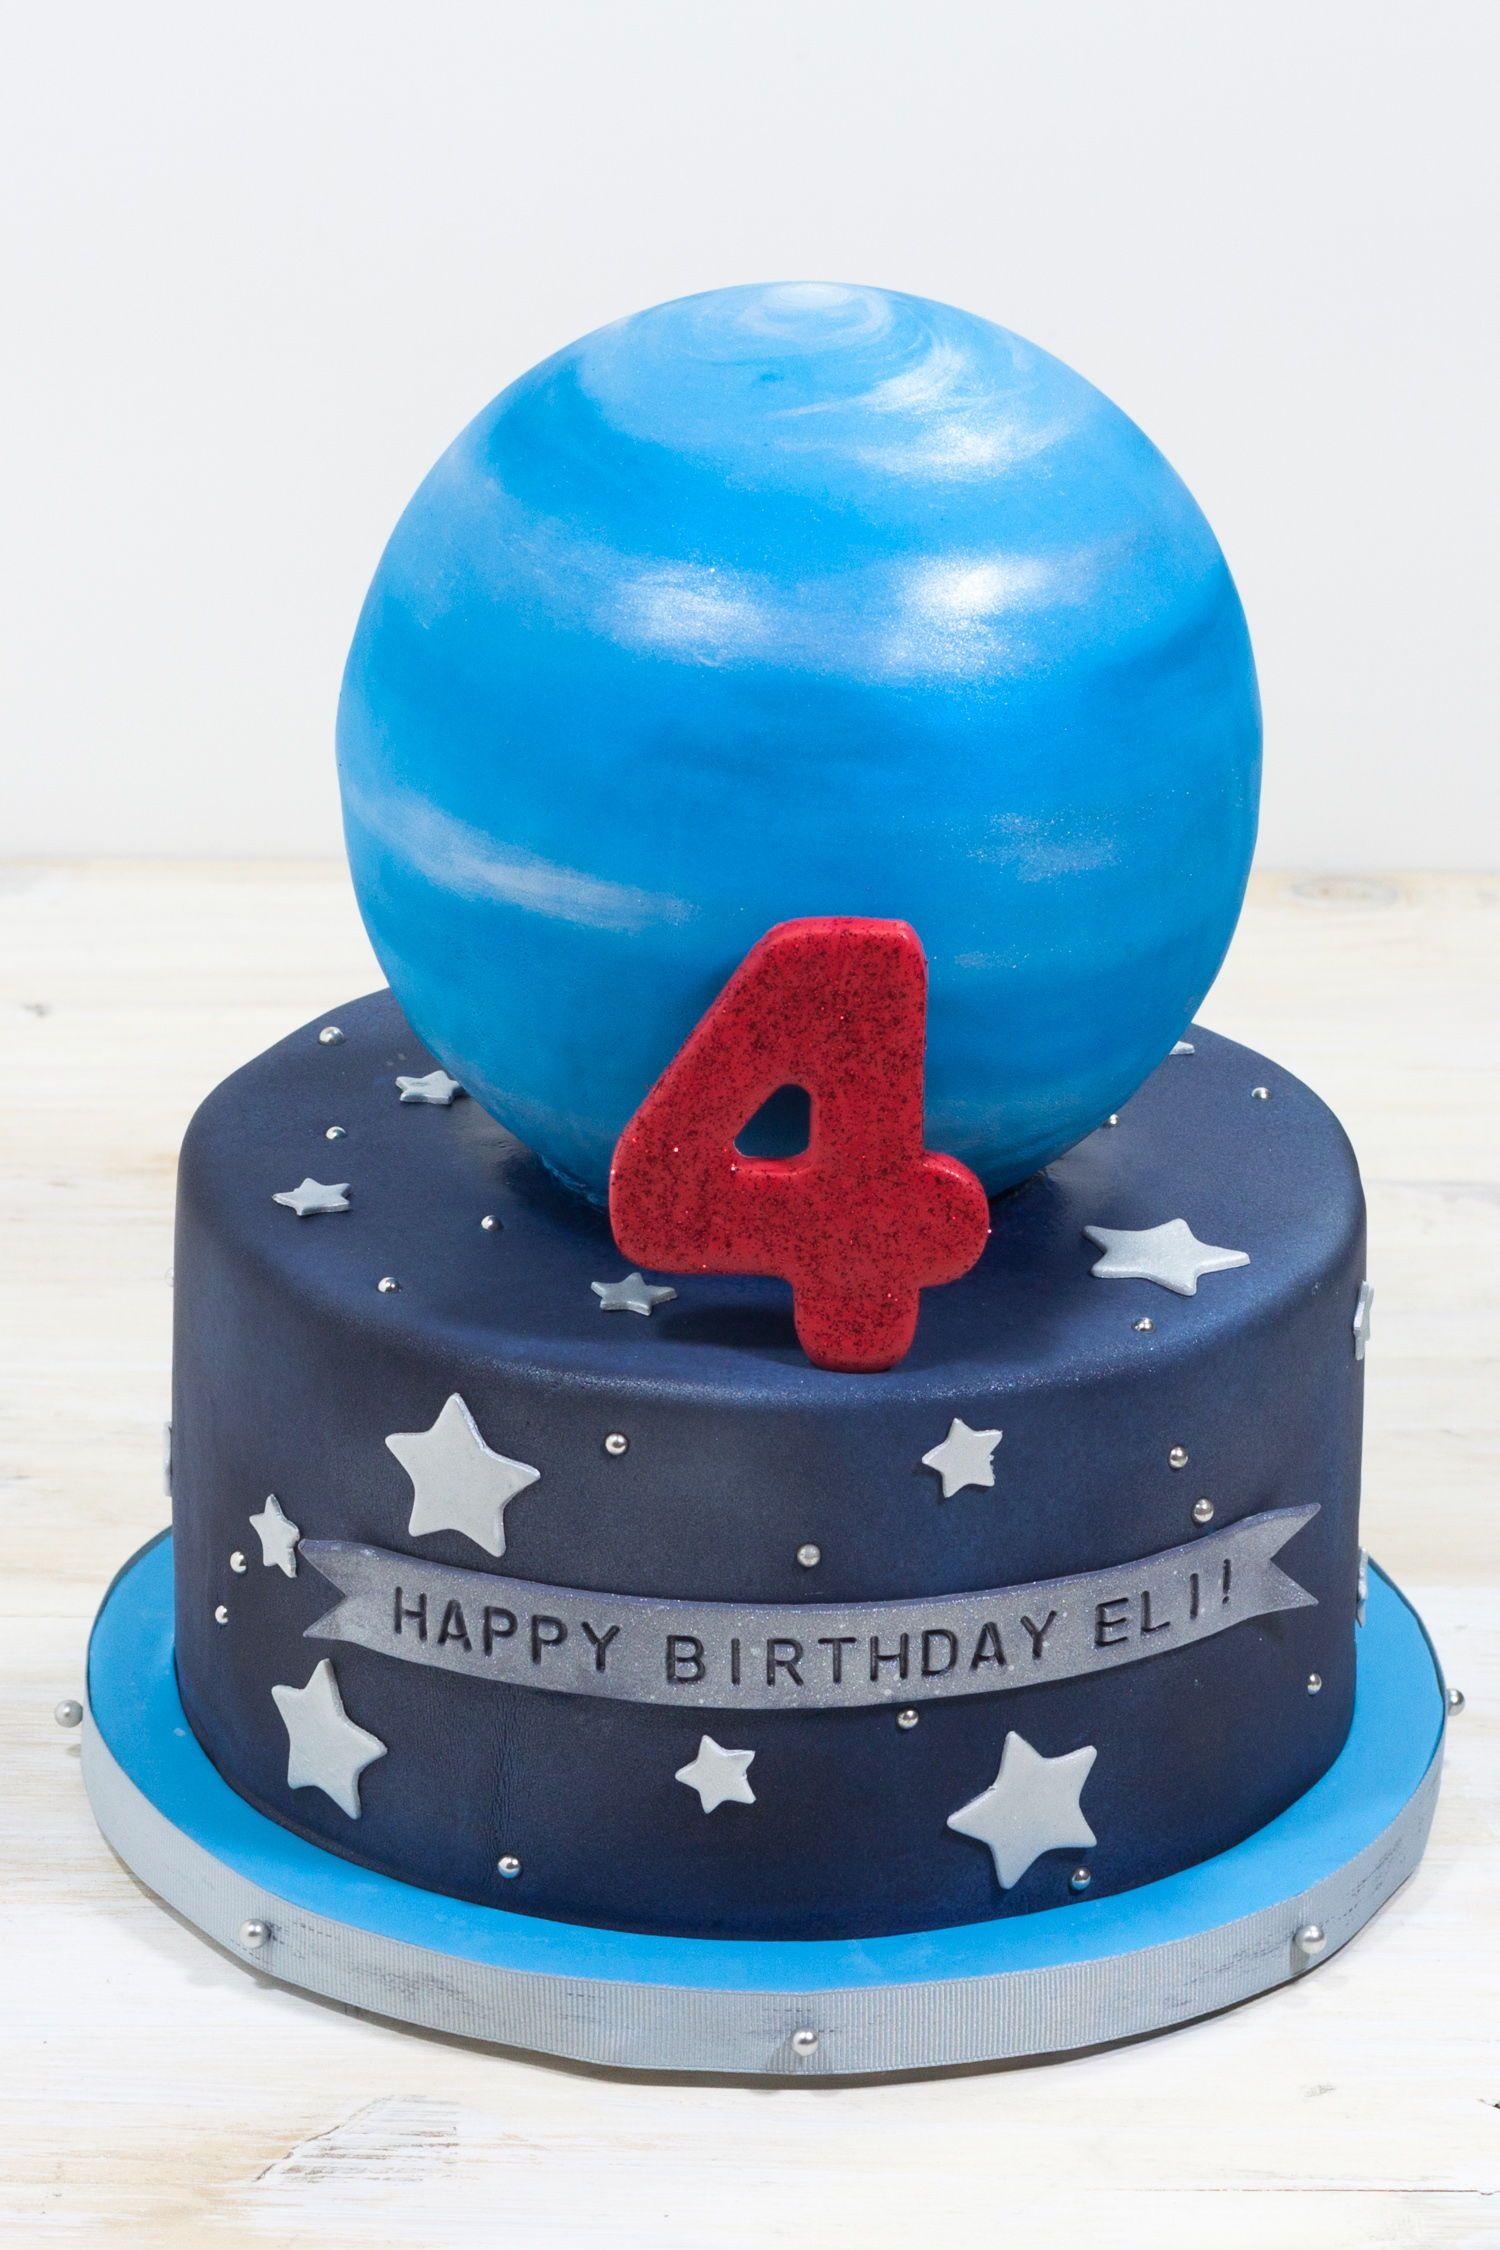 Whipped custom space themed birthday cake